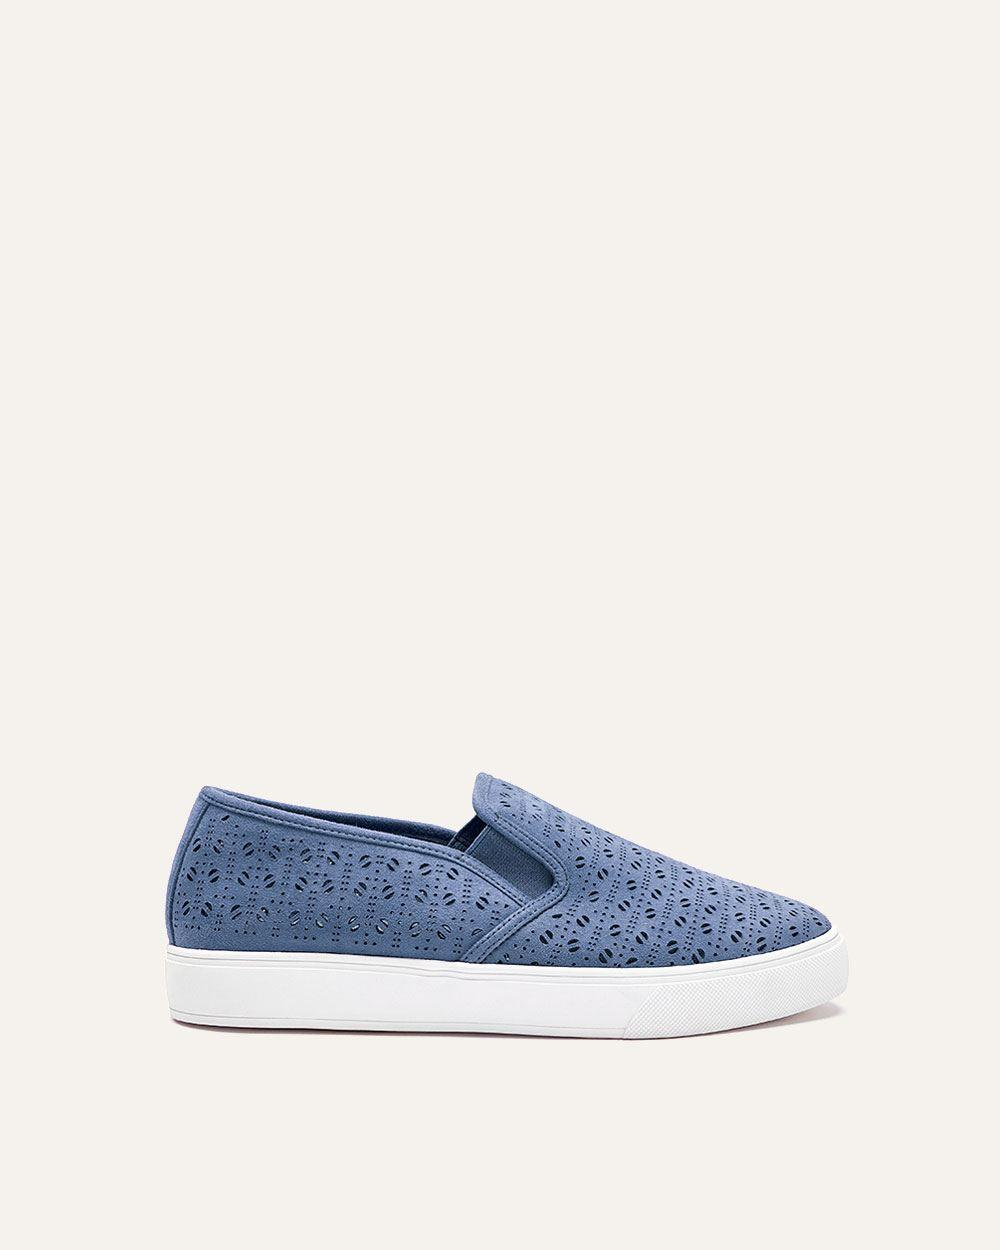 b0ec19c93ad Lyst - Addition Elle Wide Laser Cut Slip-on Sneakers in Blue